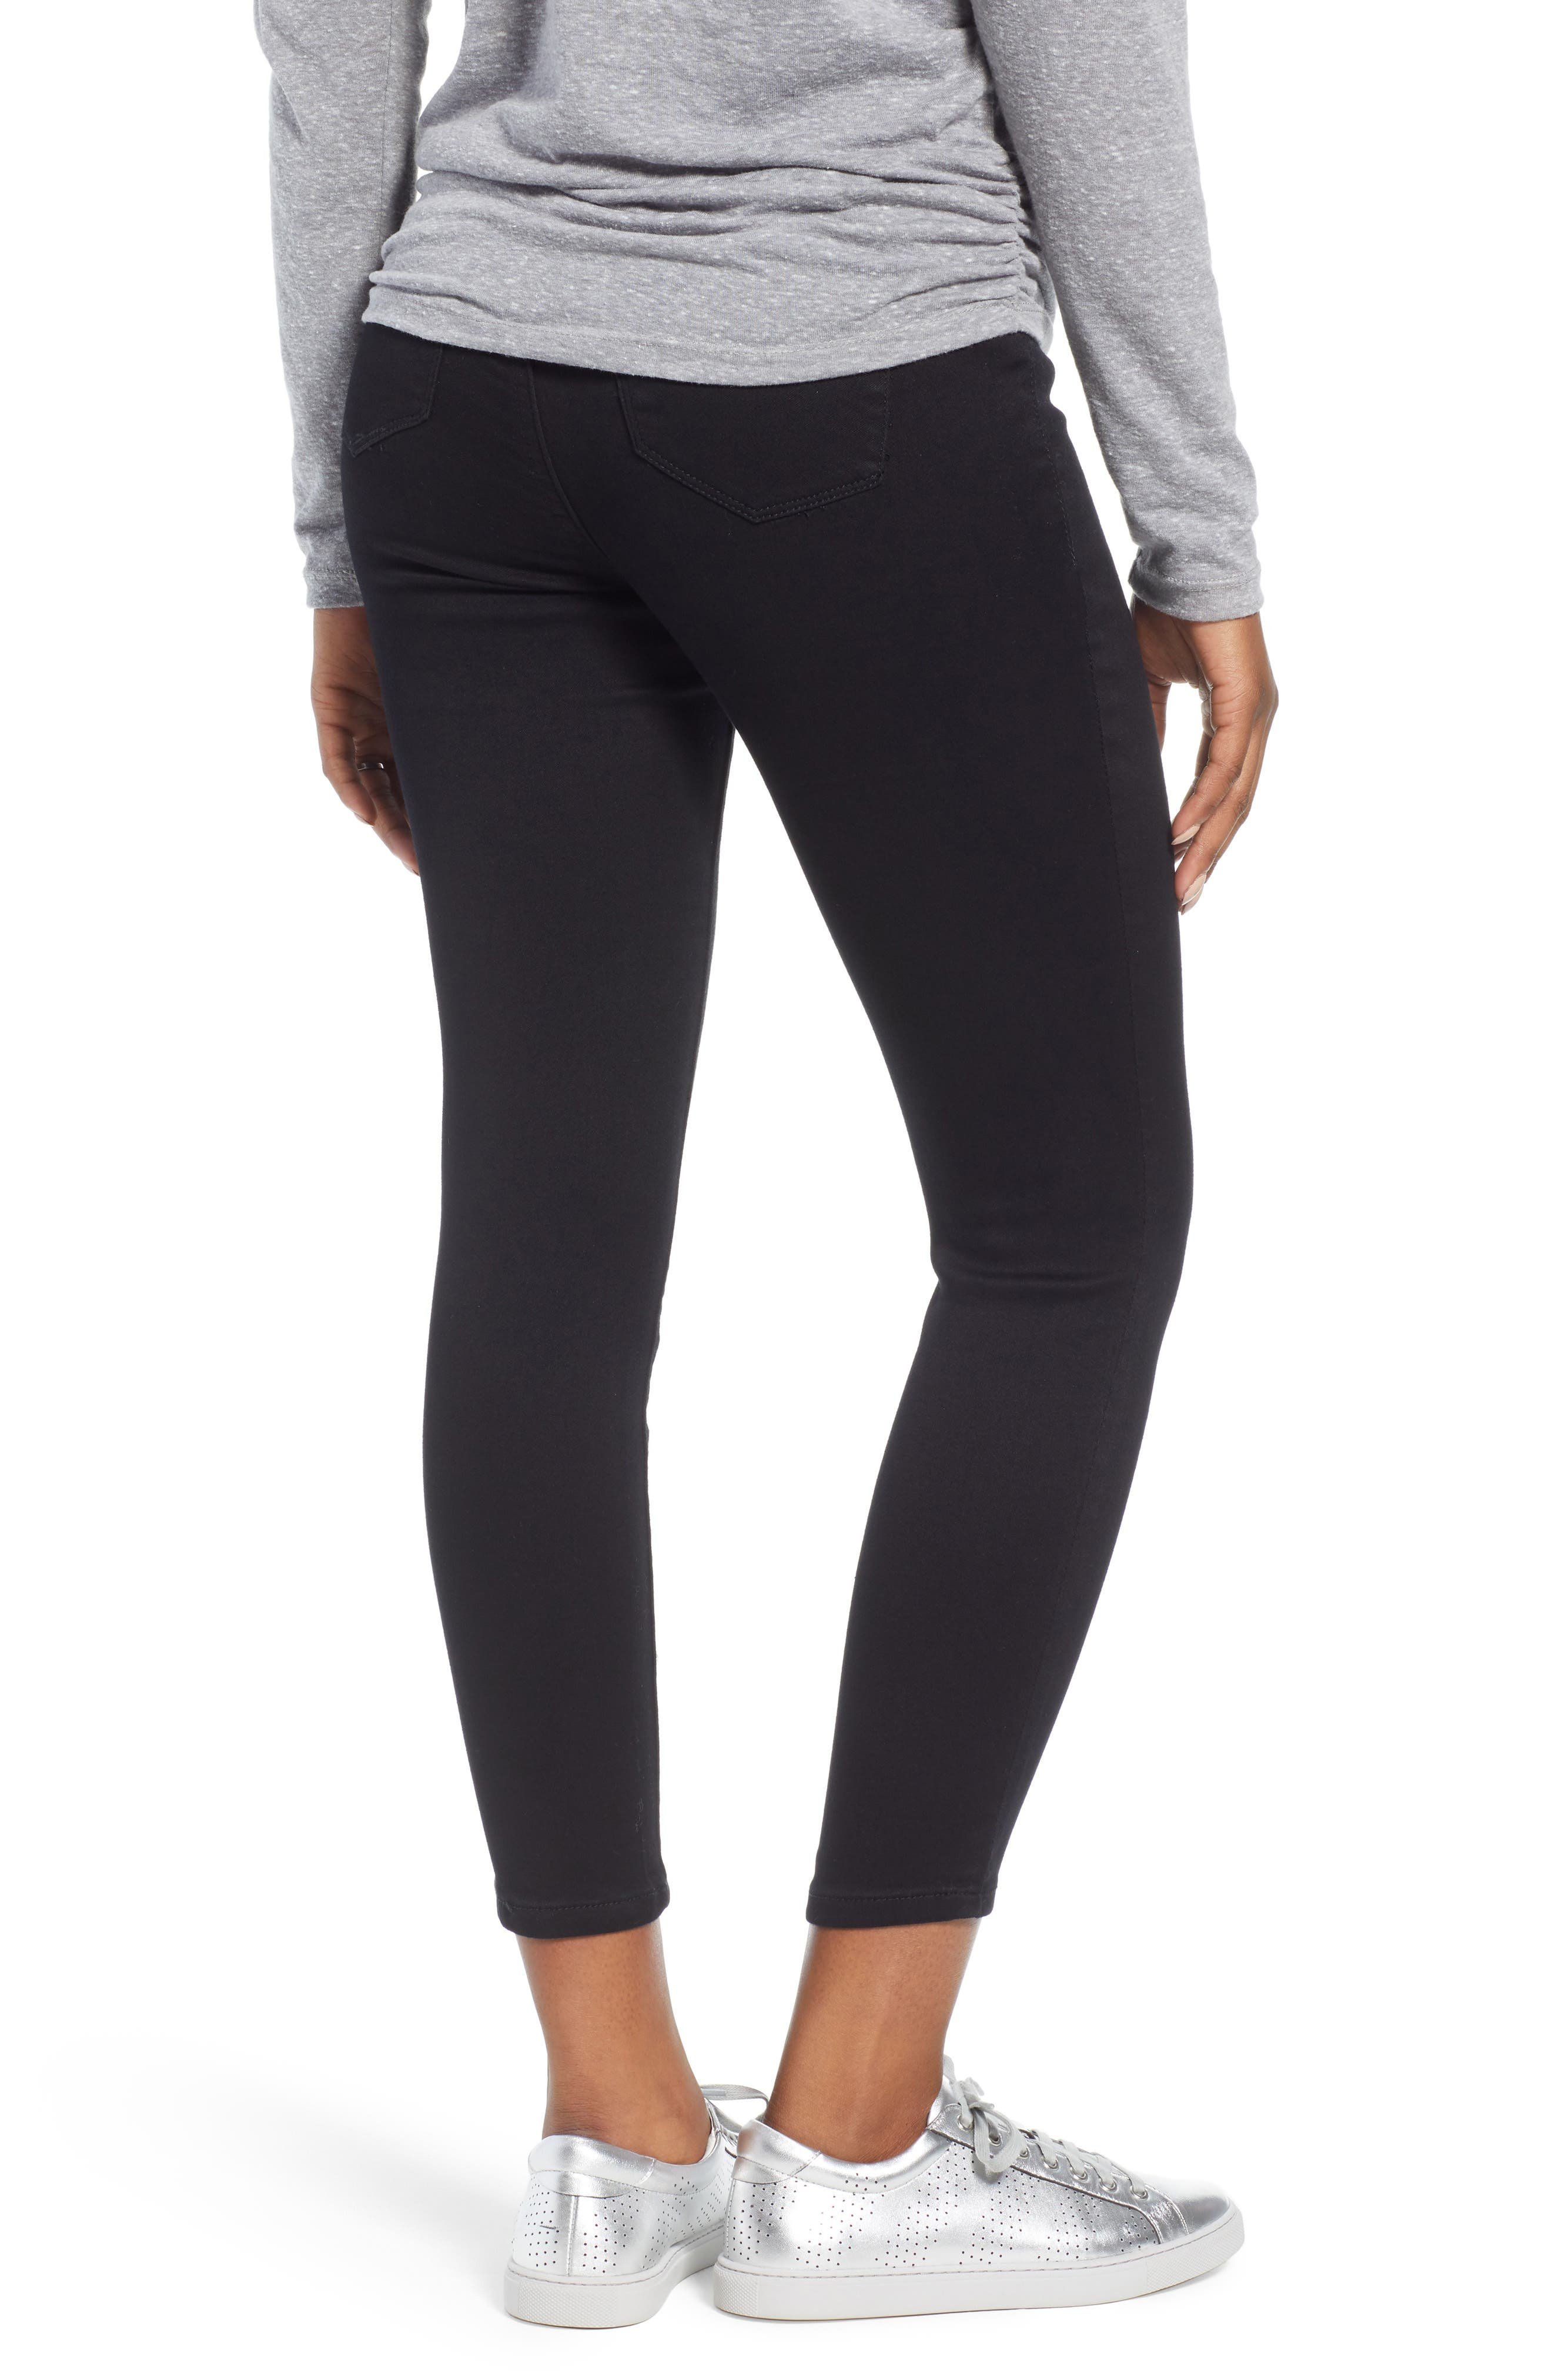 Butter Ankle Super Skinny Maternity Jeans,                             Alternate thumbnail 2, color,                             BLACK